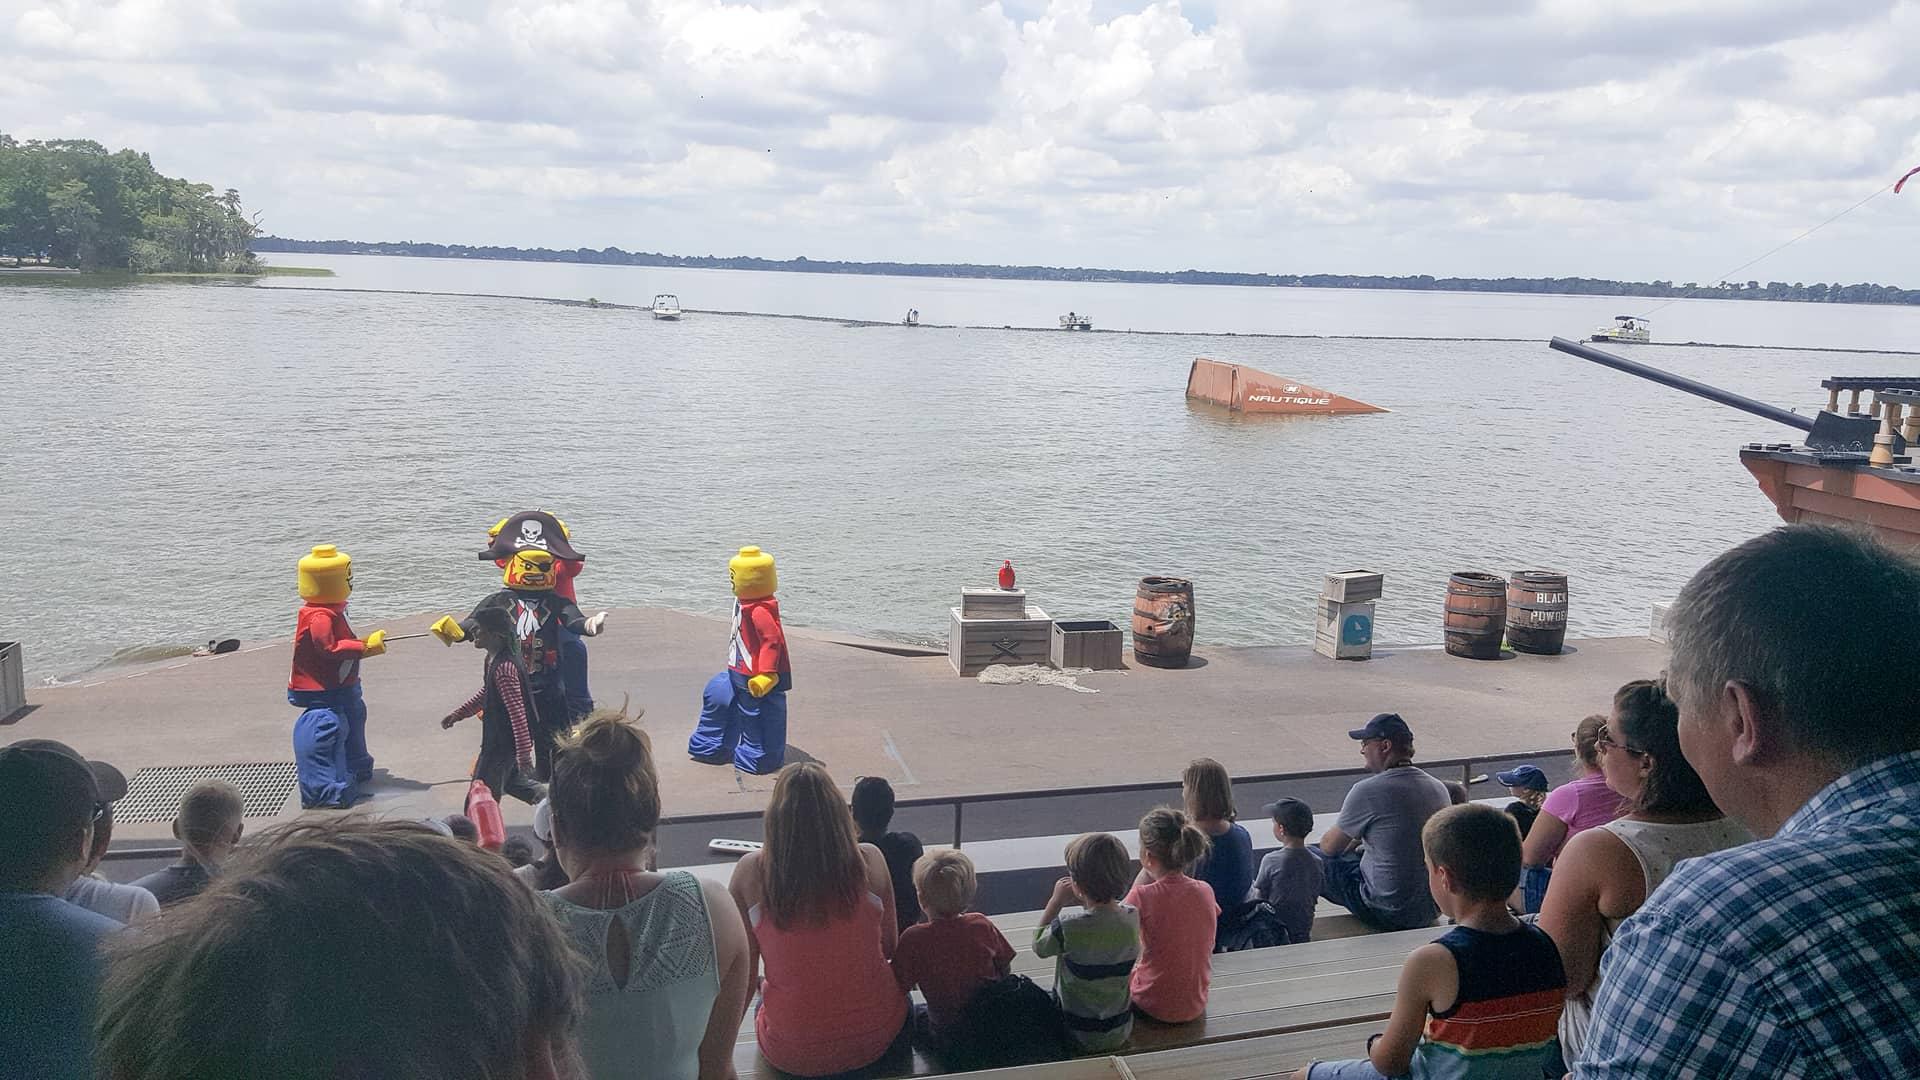 Legoland Florida - Lego Pirate show